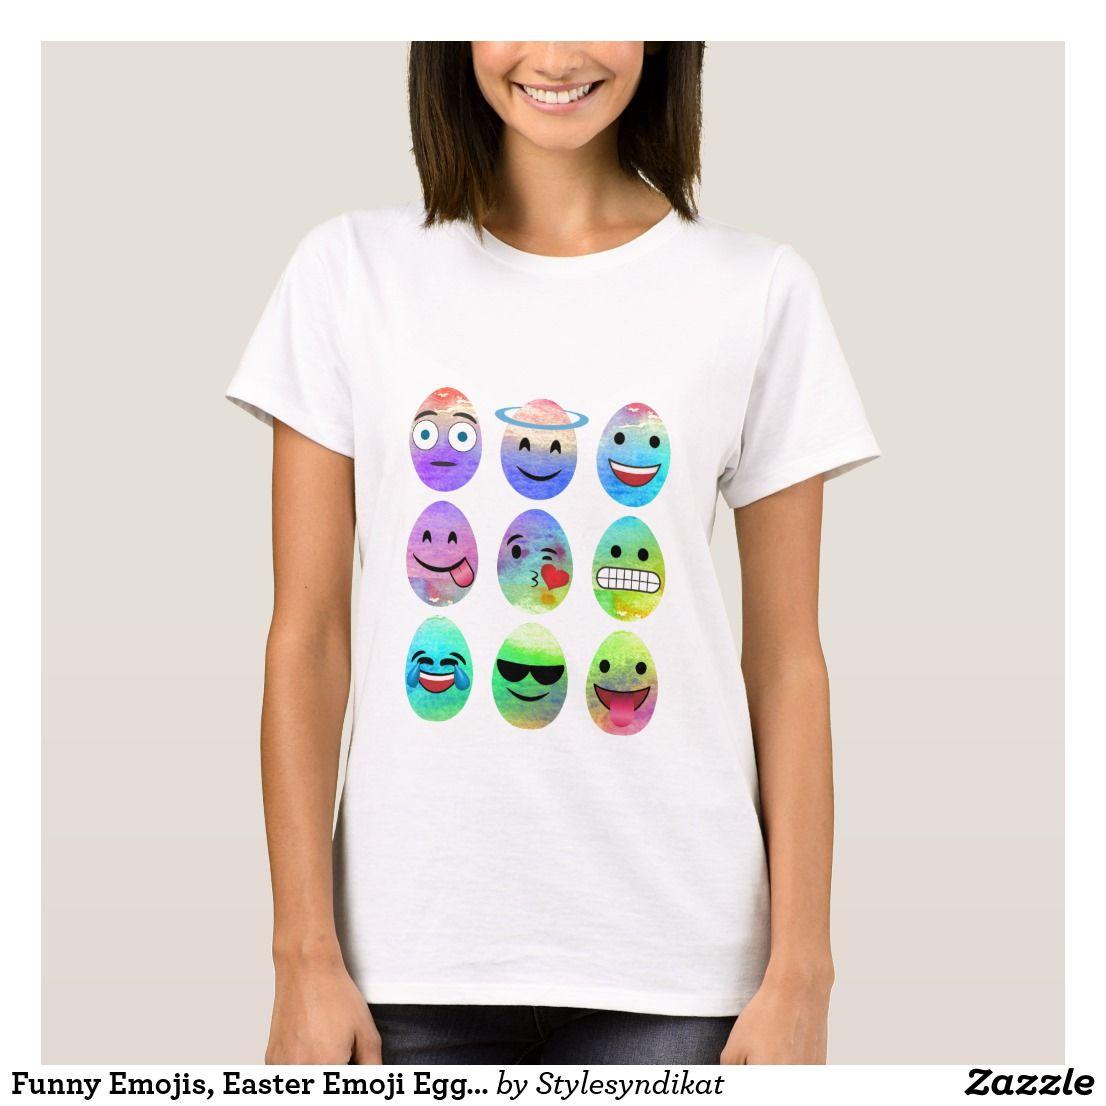 Funny emojis easter emoji eggs emoticon egg t shirt easter gifts funny emojis easter emoji eggs emoticon egg t shirt negle Images